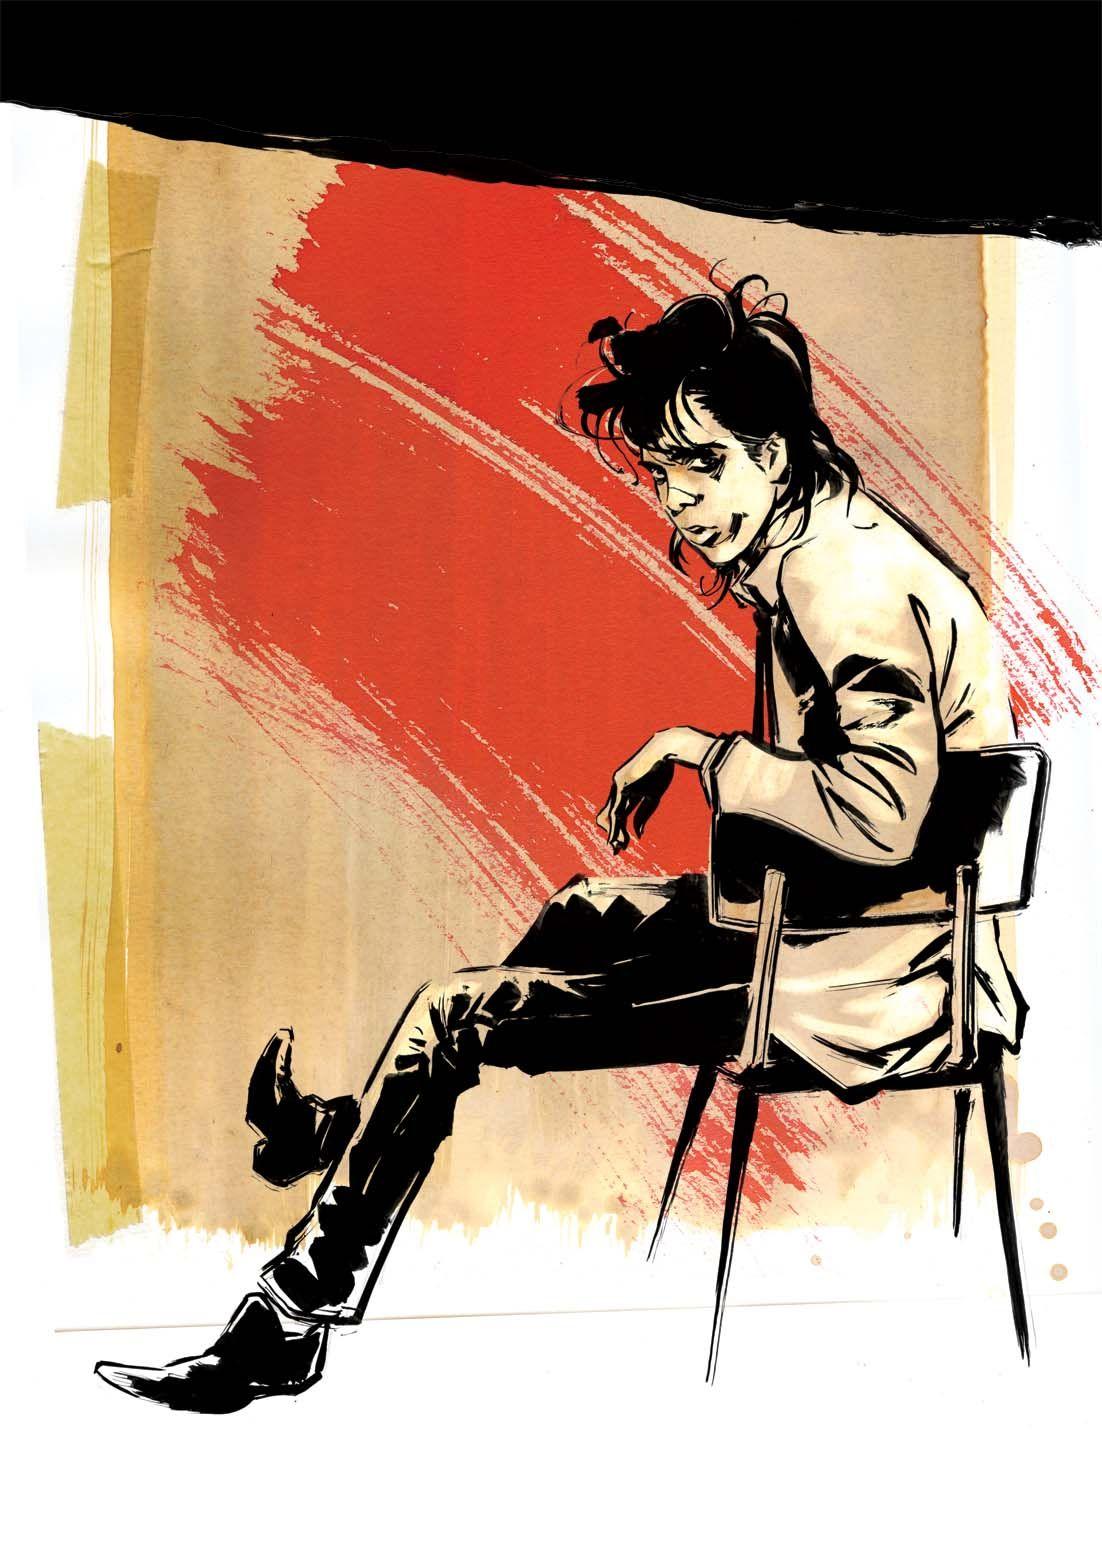 Stuhl comic  Nick-Stuhl | Comics | Pinterest | Entdecke die besten Ideen über ...